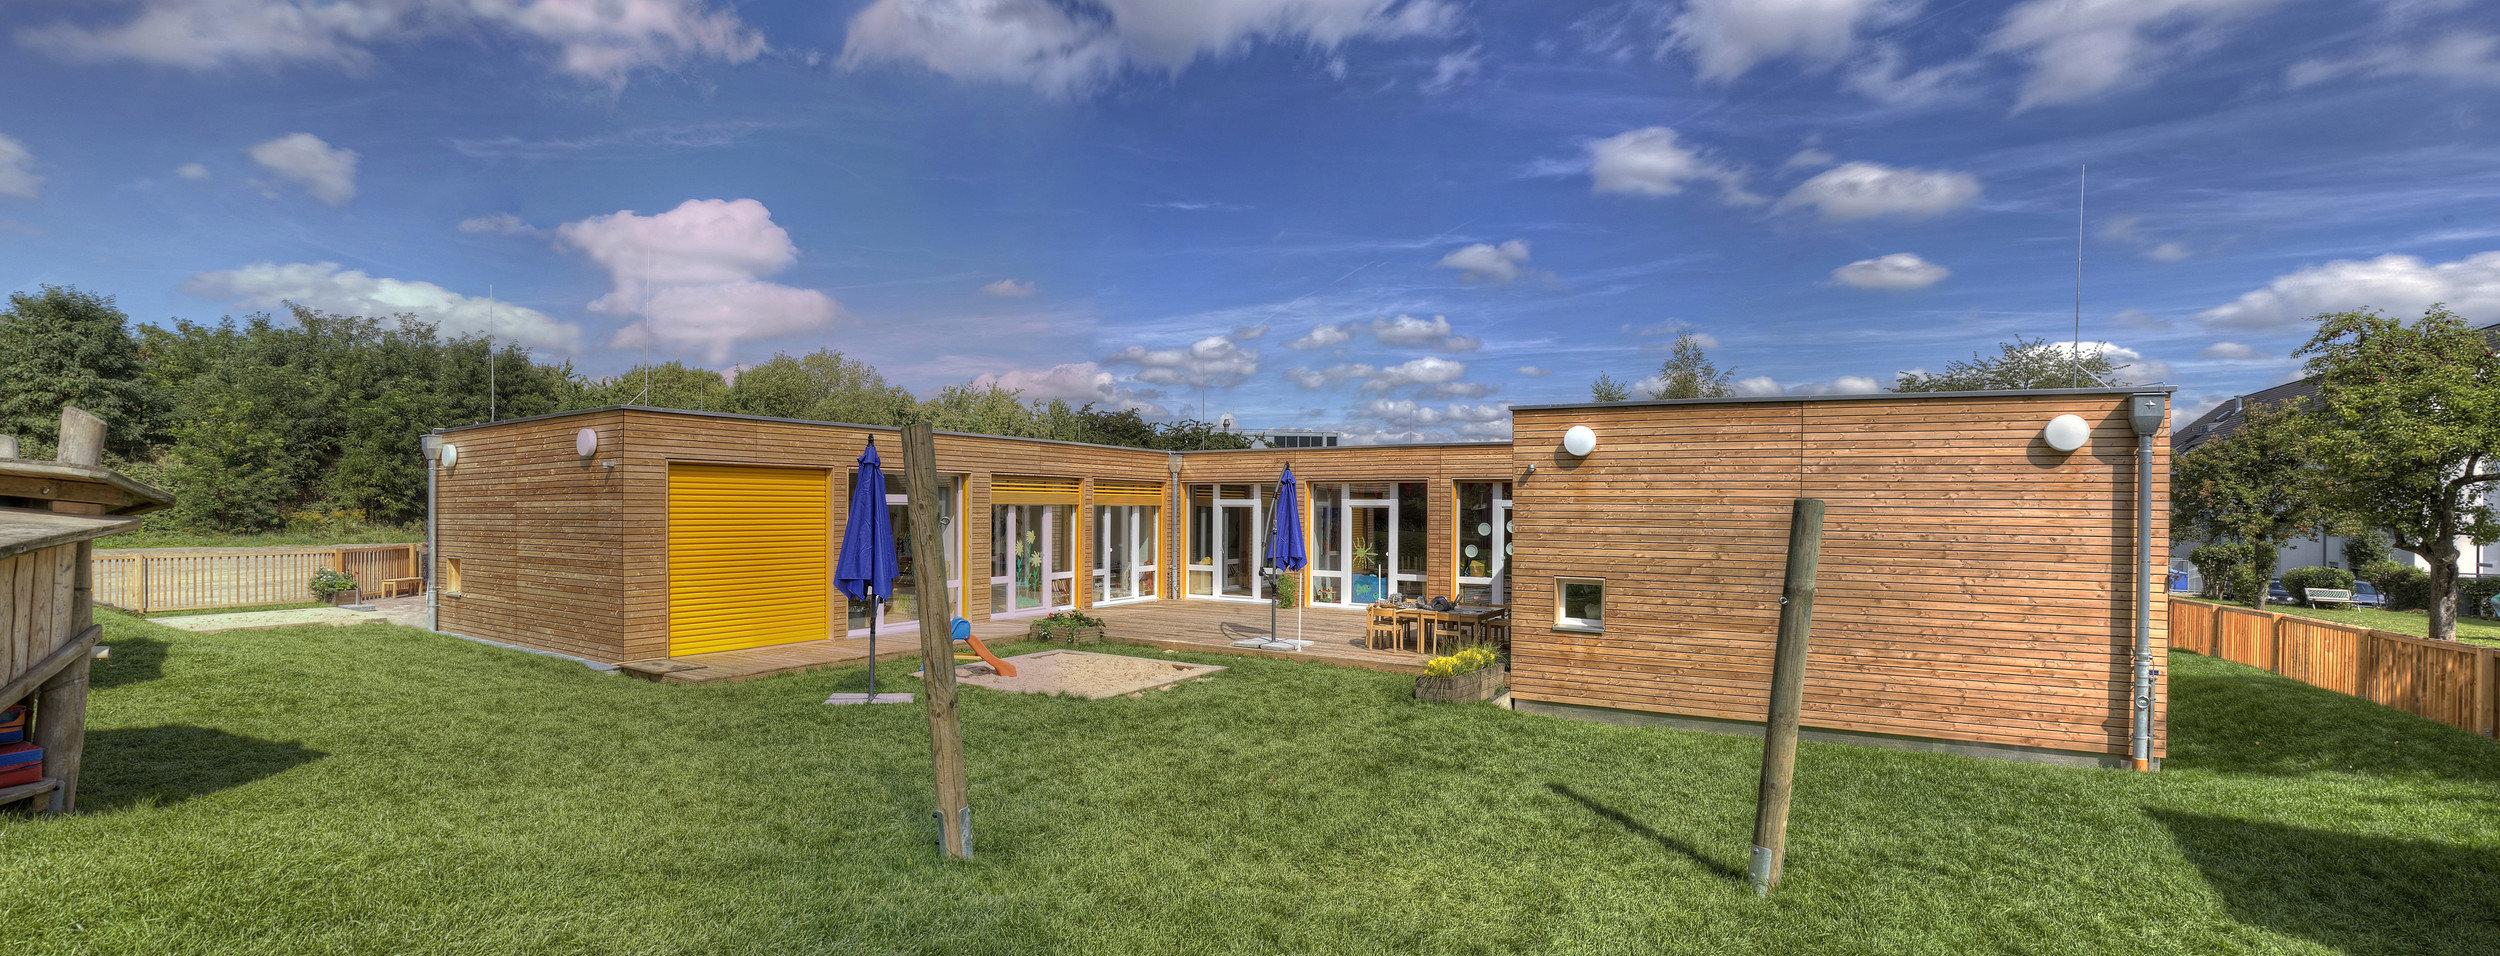 Erdgeschossige Kindertagesstätte in Holz-Modulbauweise